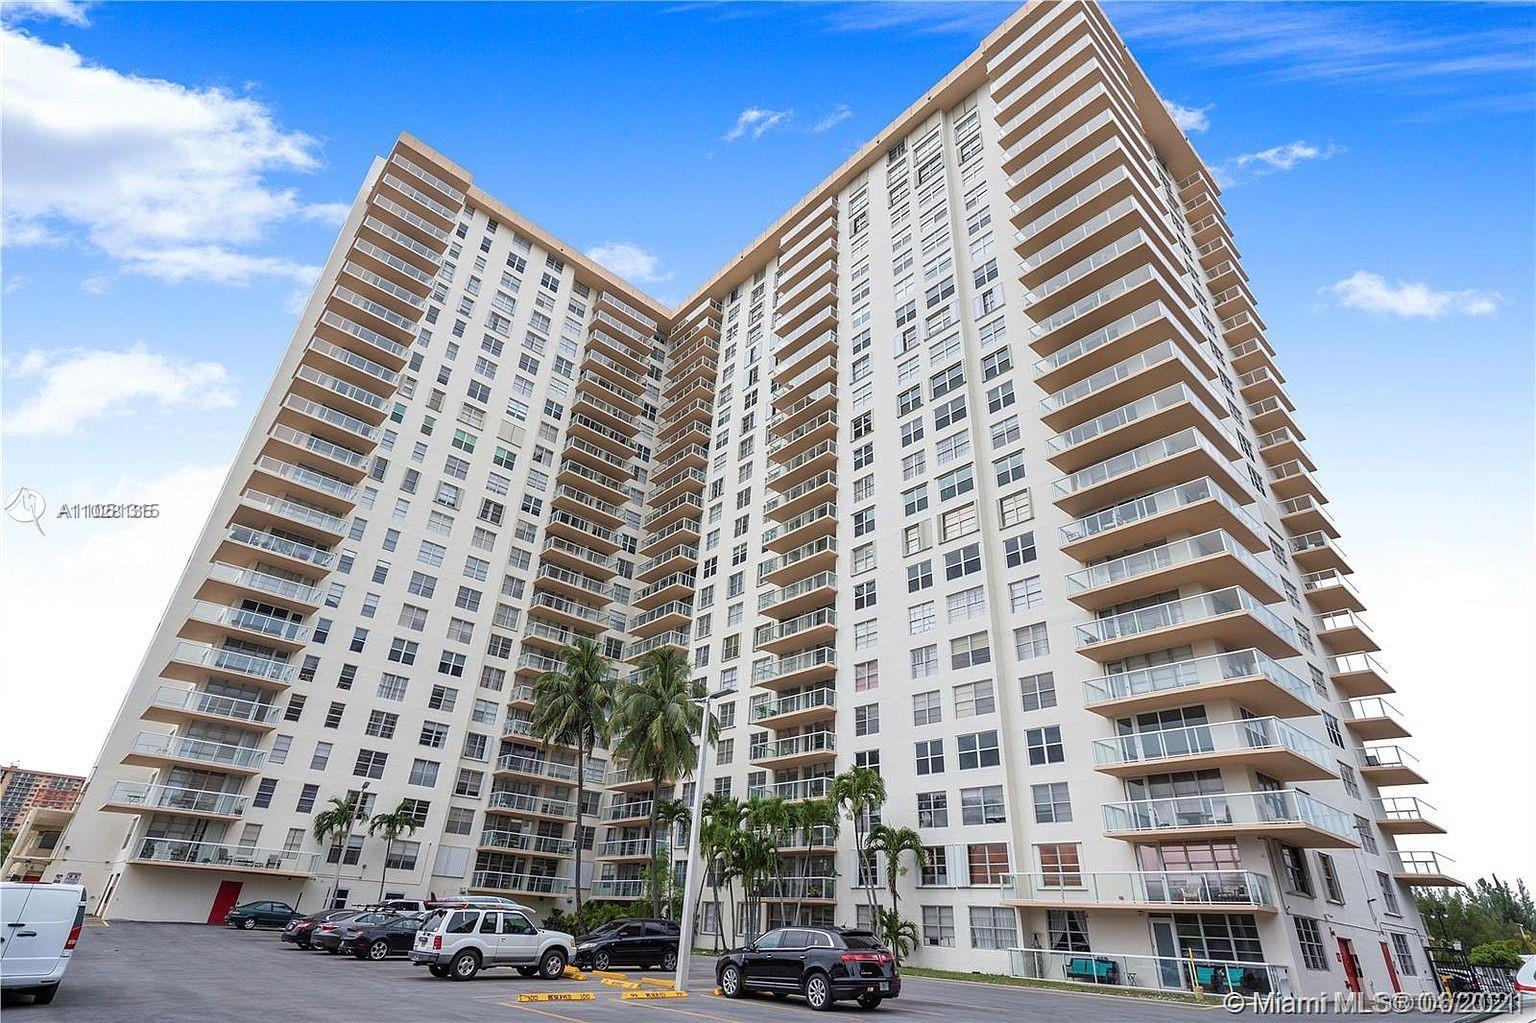 Winston Tower 300 #403 - 230 174th St #403, Sunny Isles Beach, FL 33160